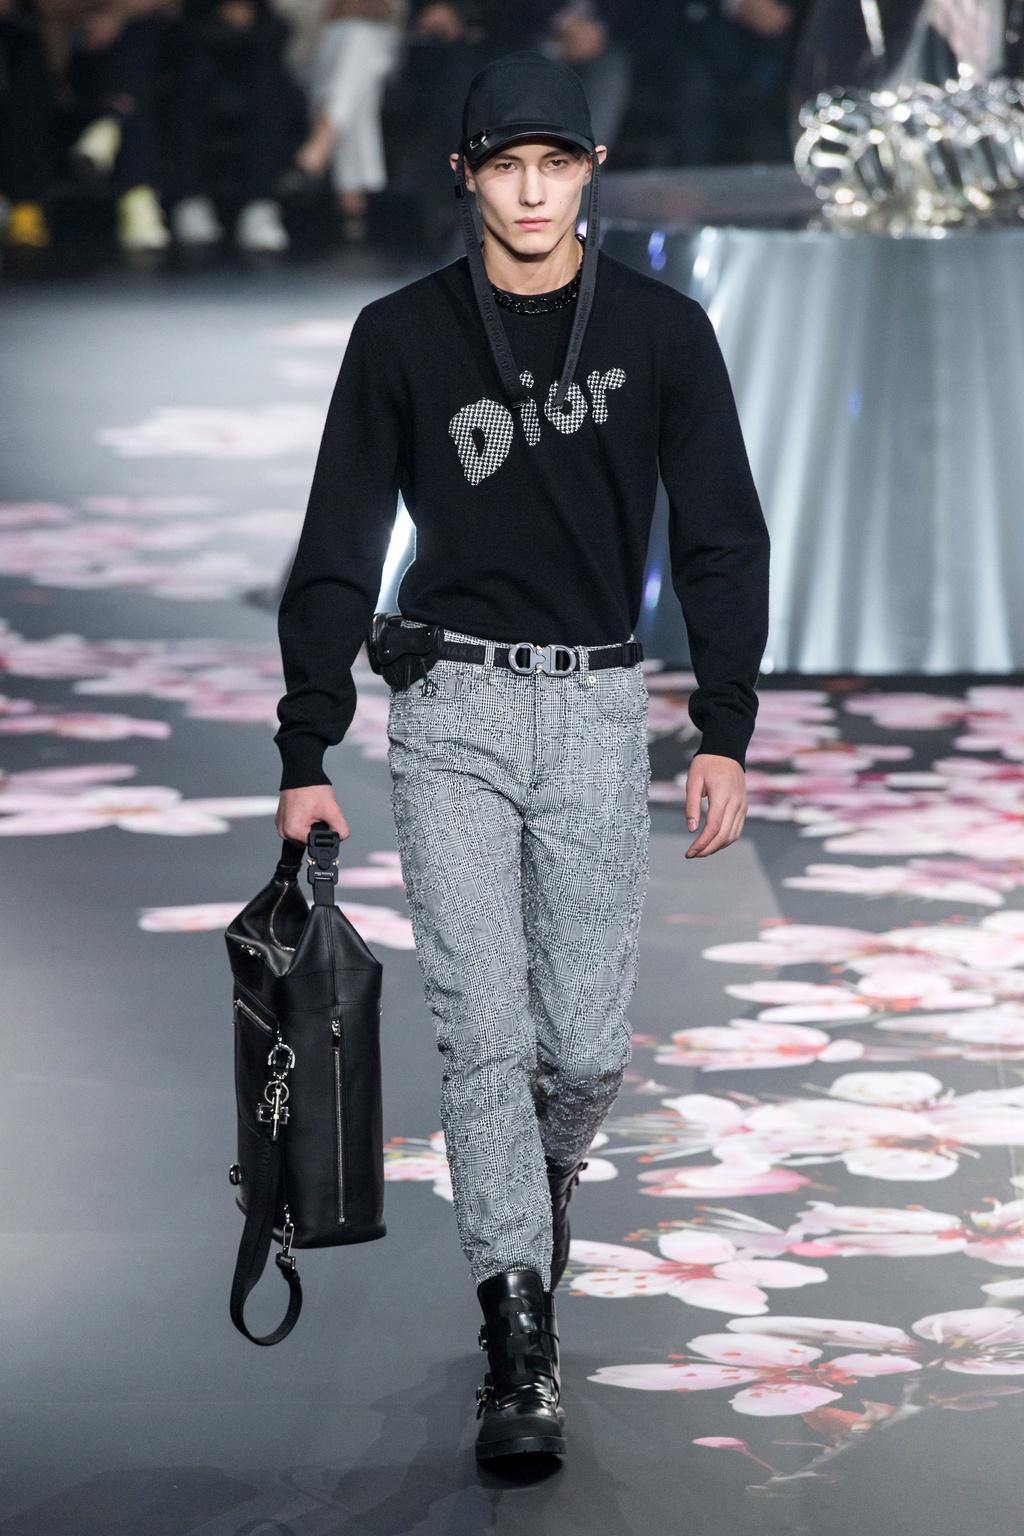 Show dien Dior gay sot voi phu kien giong bao dung sung hinh anh 12